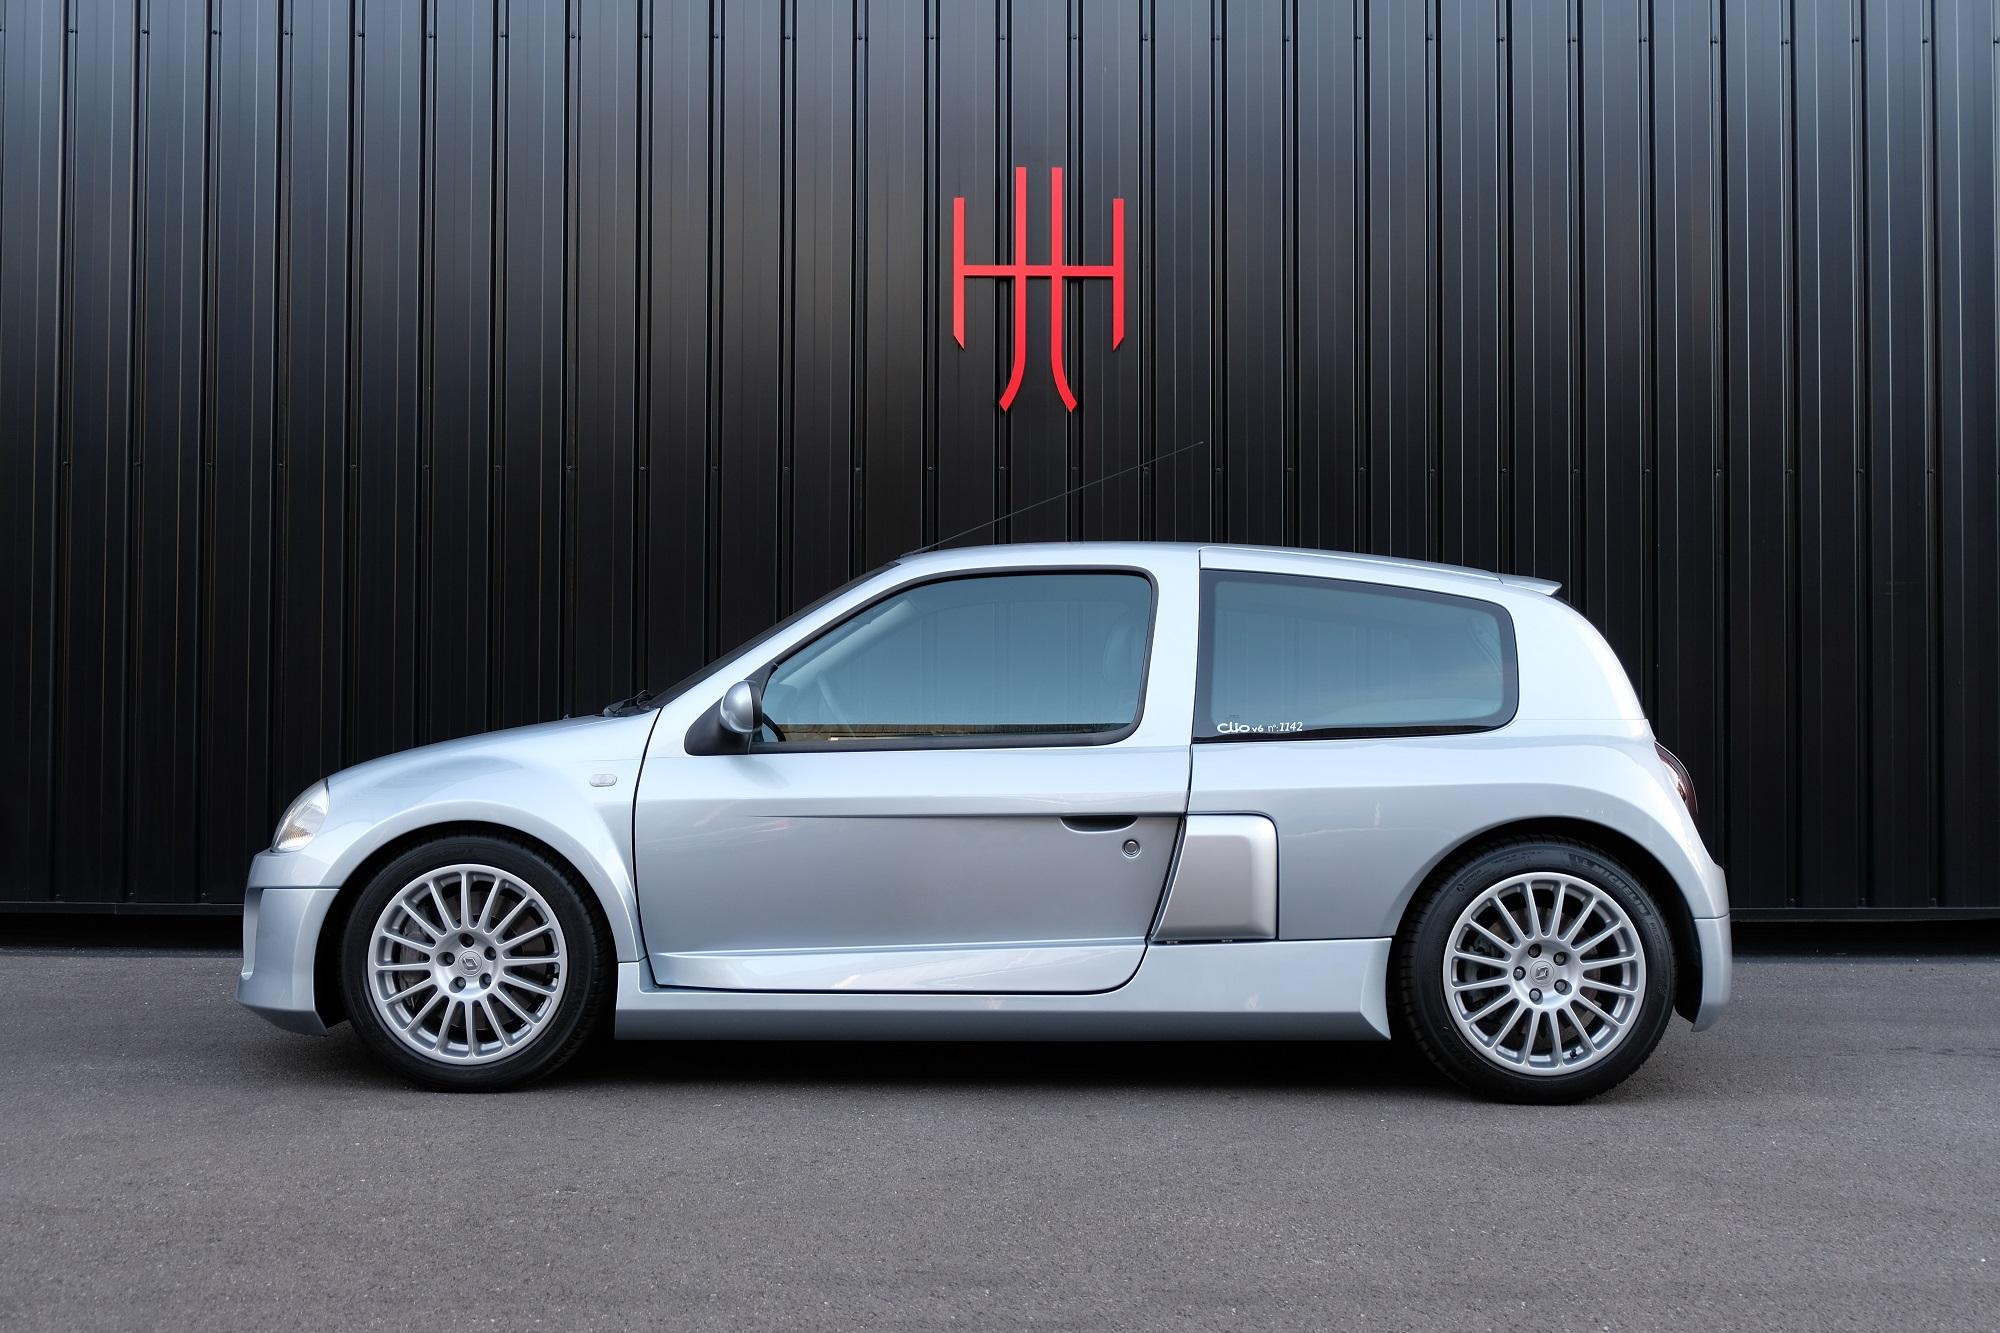 RENAULT CLIO V6 SPORT PHASE 1